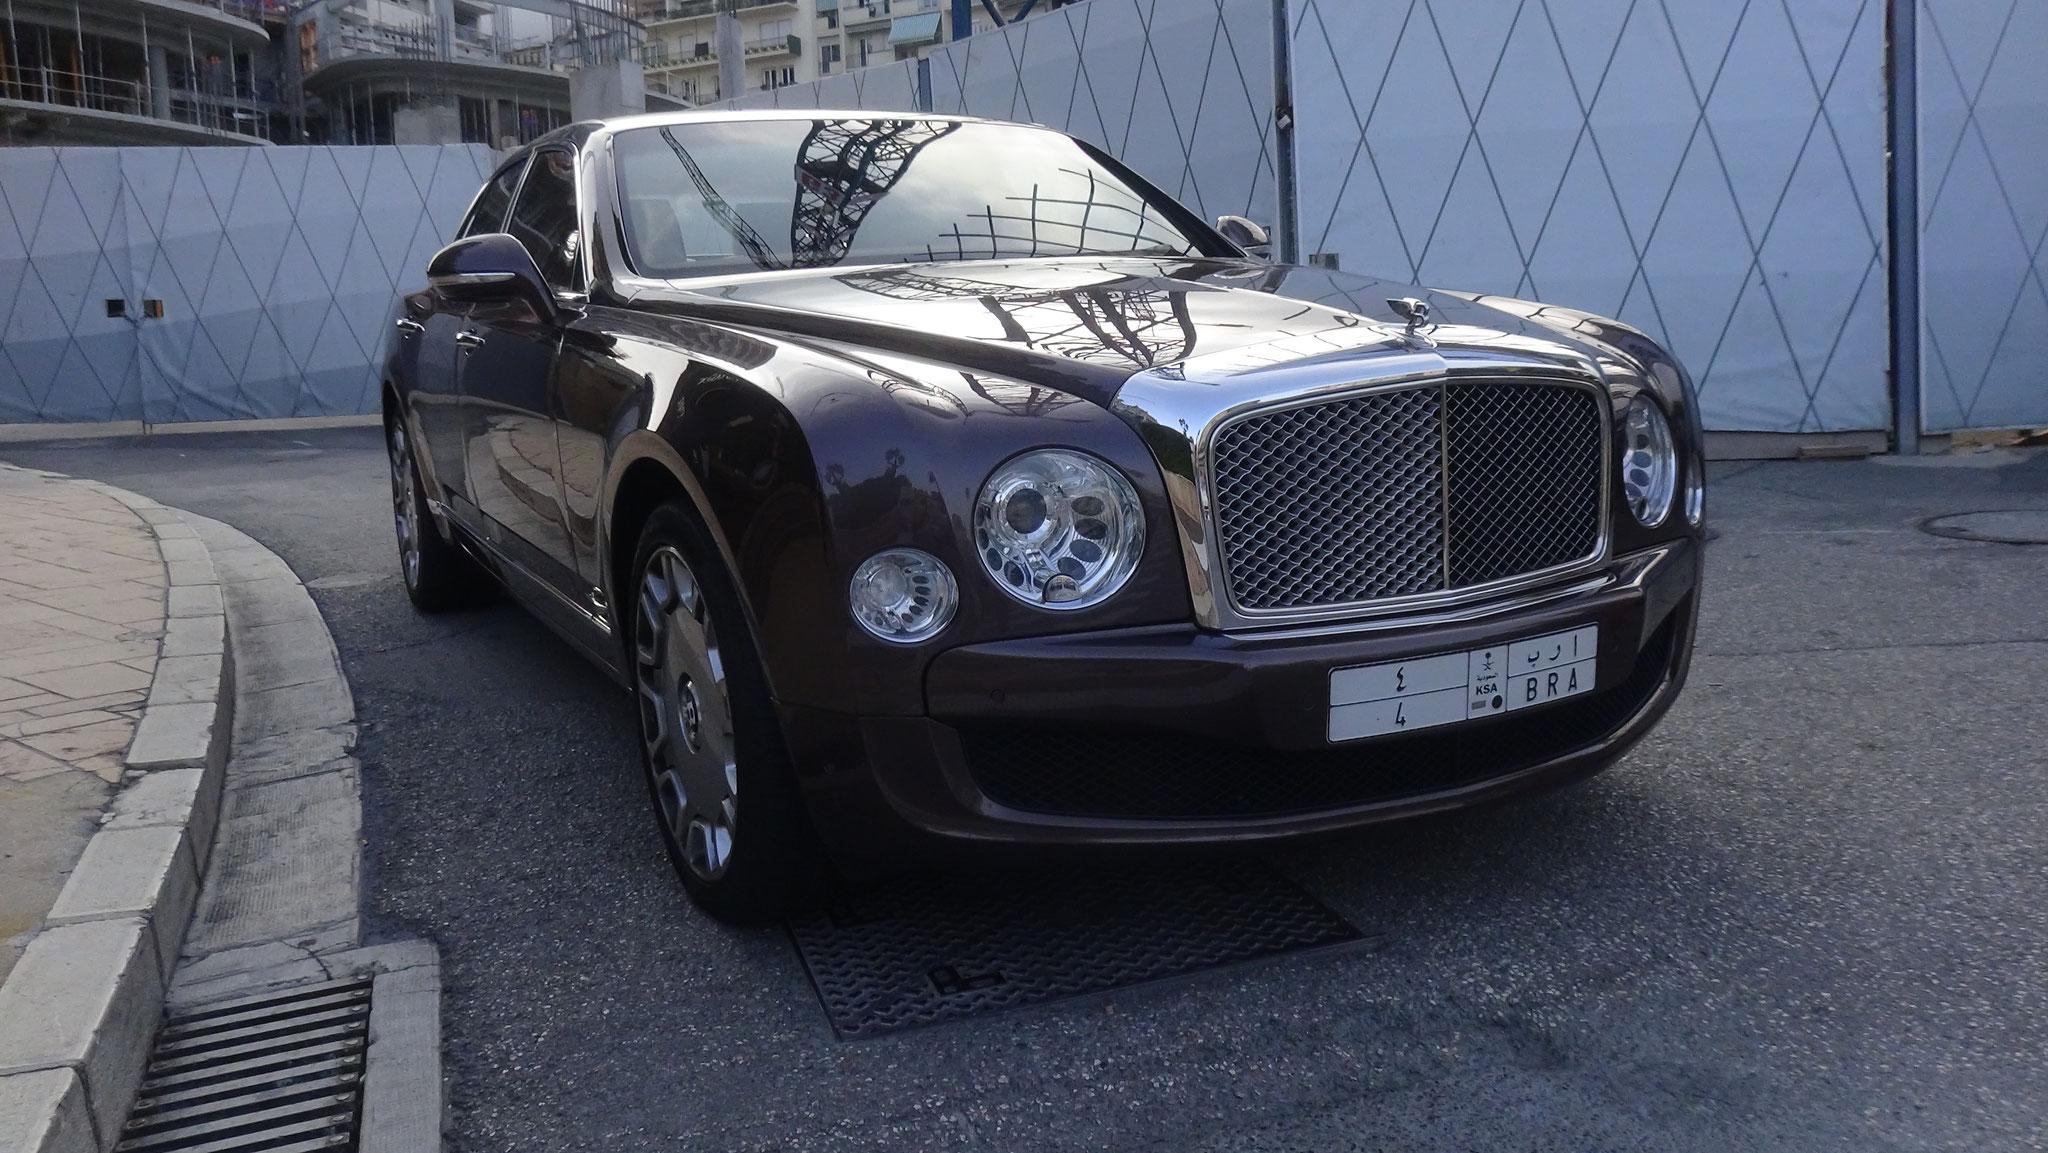 Bentley Mulsanne - 4-BRA (KSA)